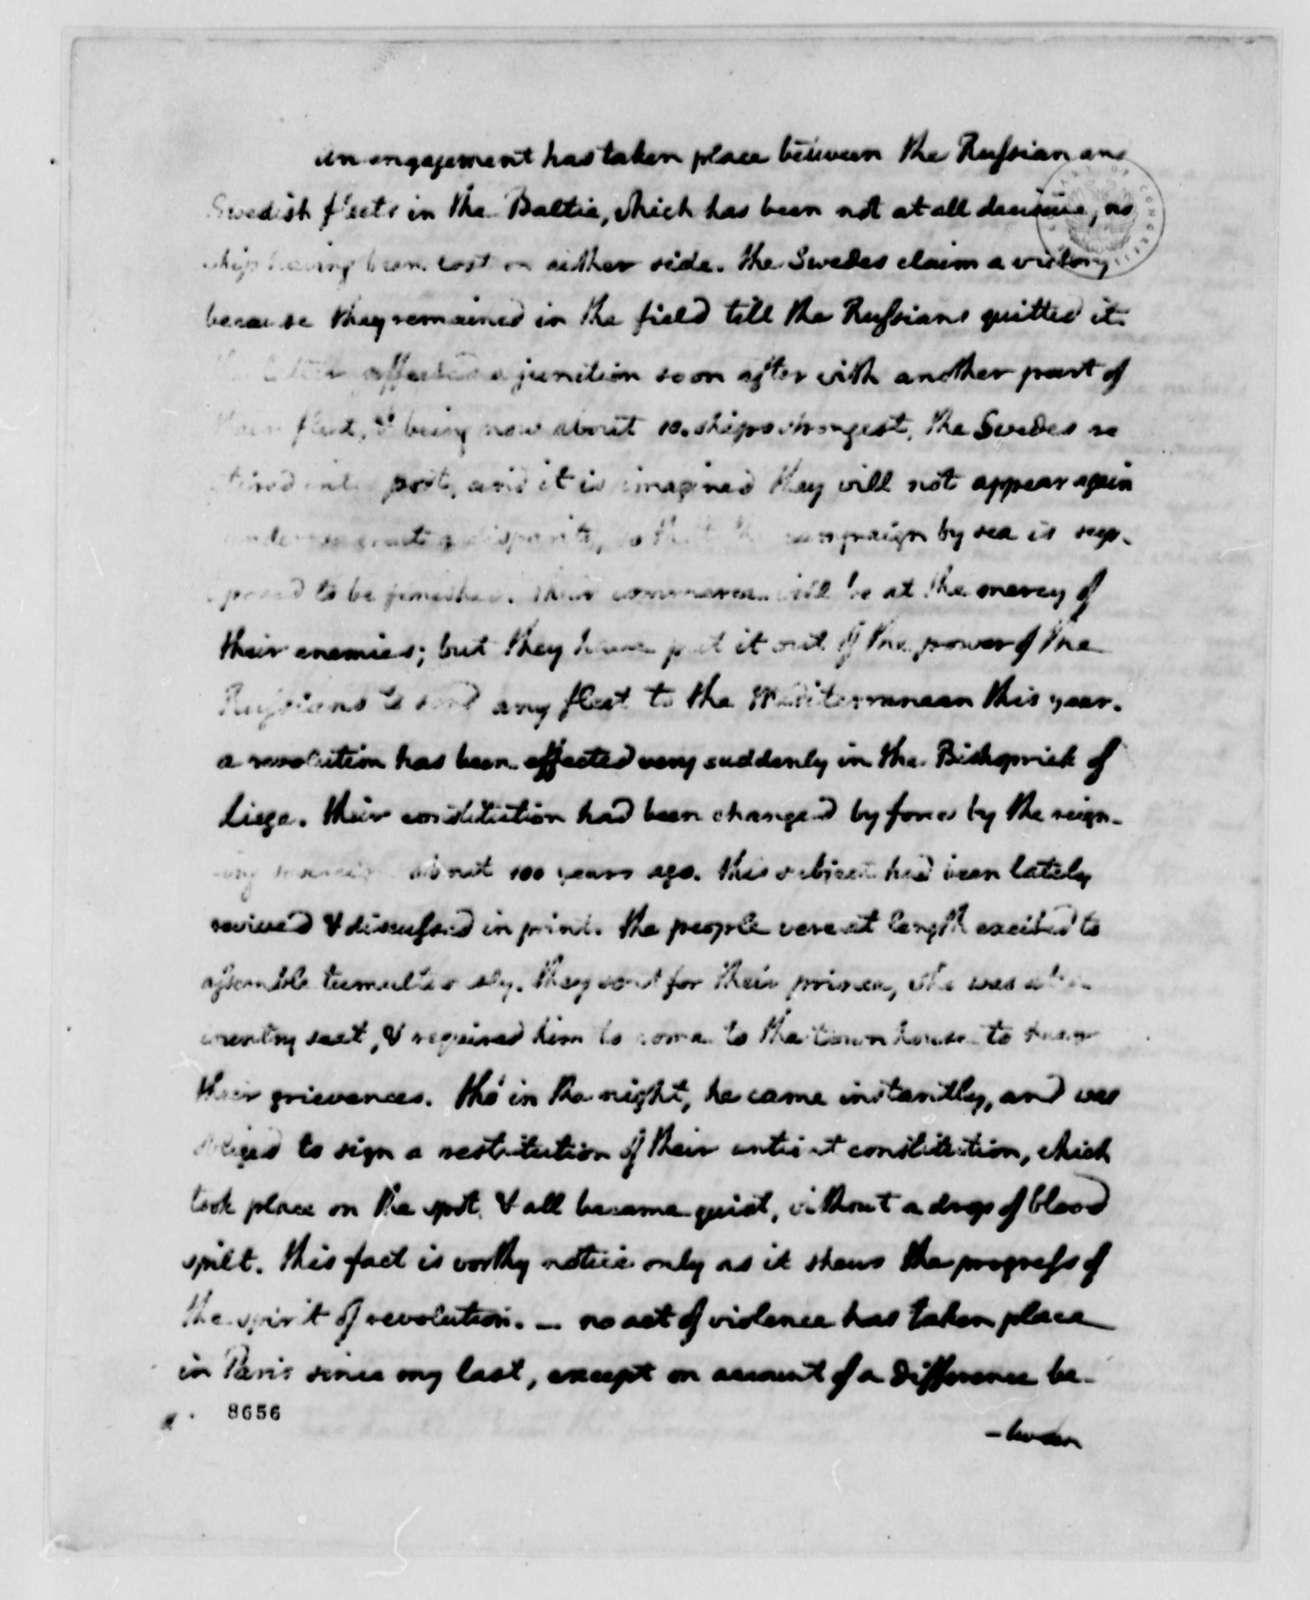 Thomas Jefferson to John Jay, August 27, 1789